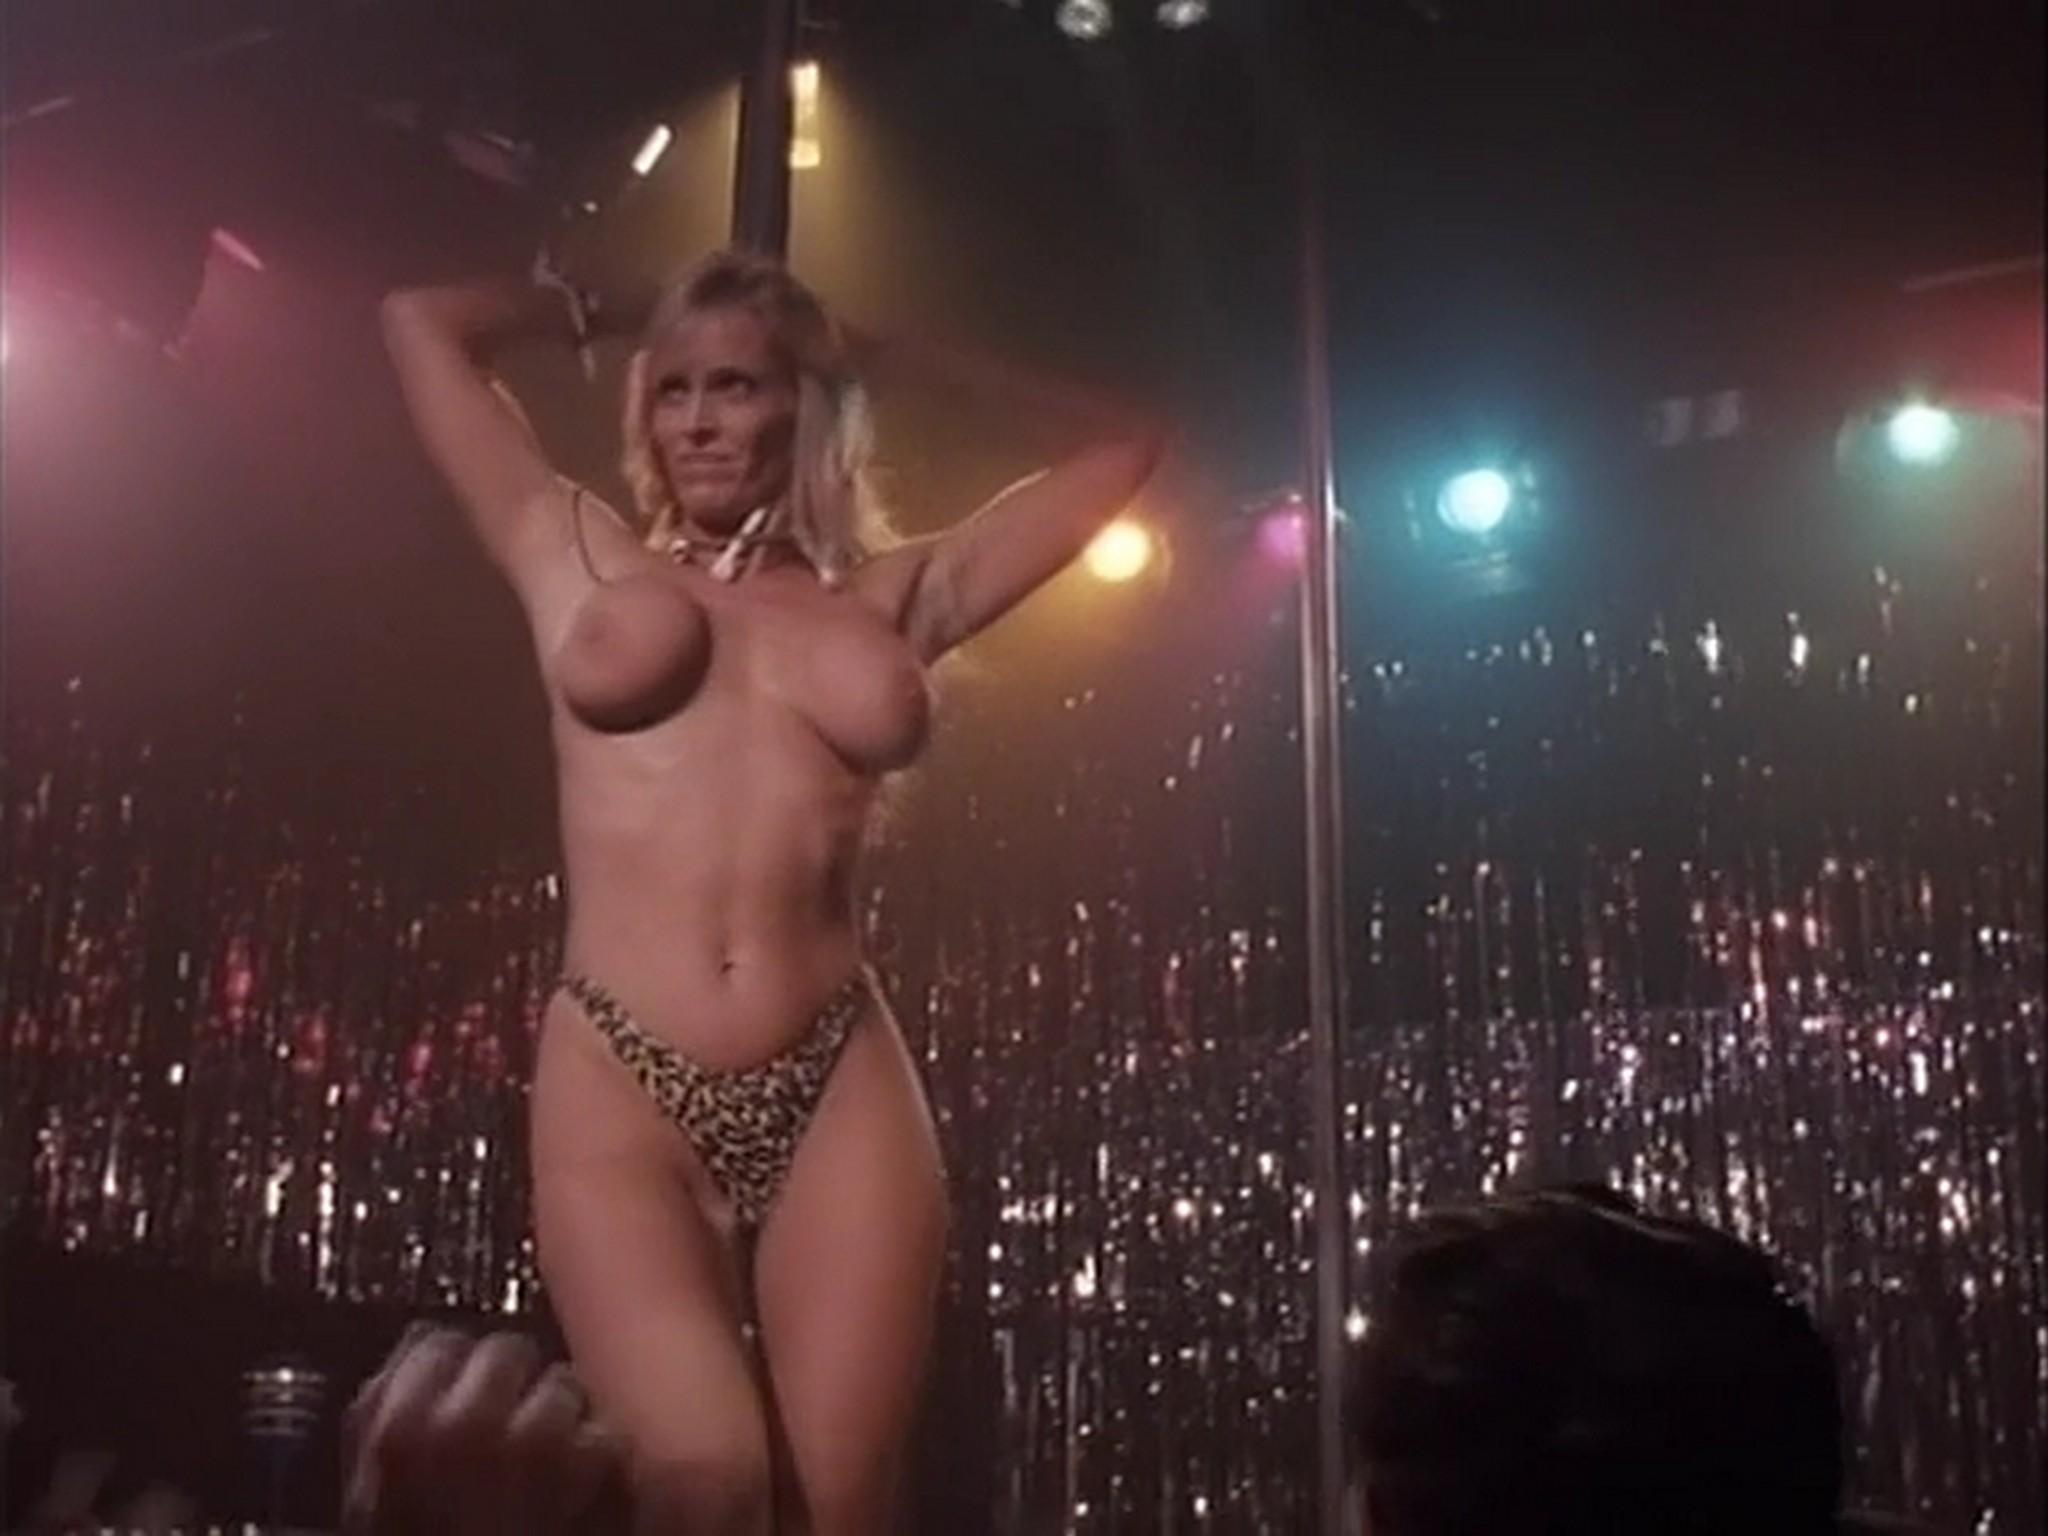 Barbara Alyn Woods nude Catya Sassoon Jill Pierce nude too as strippers Dance with Death 1991